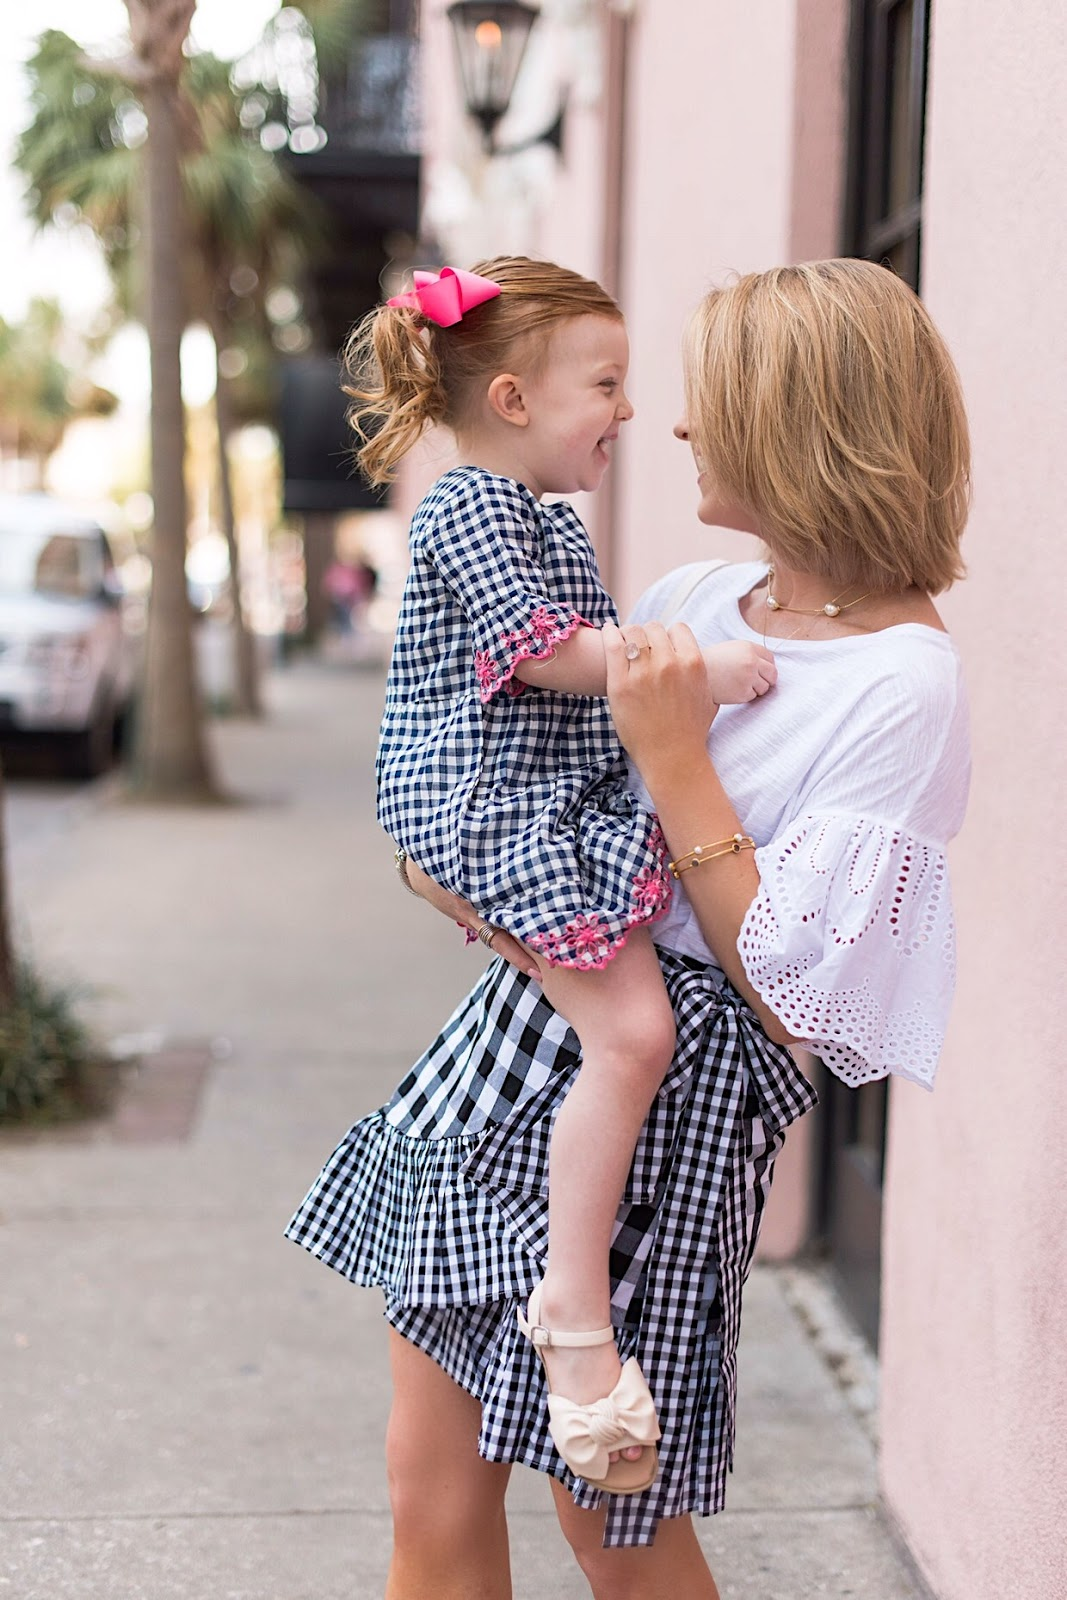 Twinning in Gingham in Charleston, SC. - Something Delightful Blog